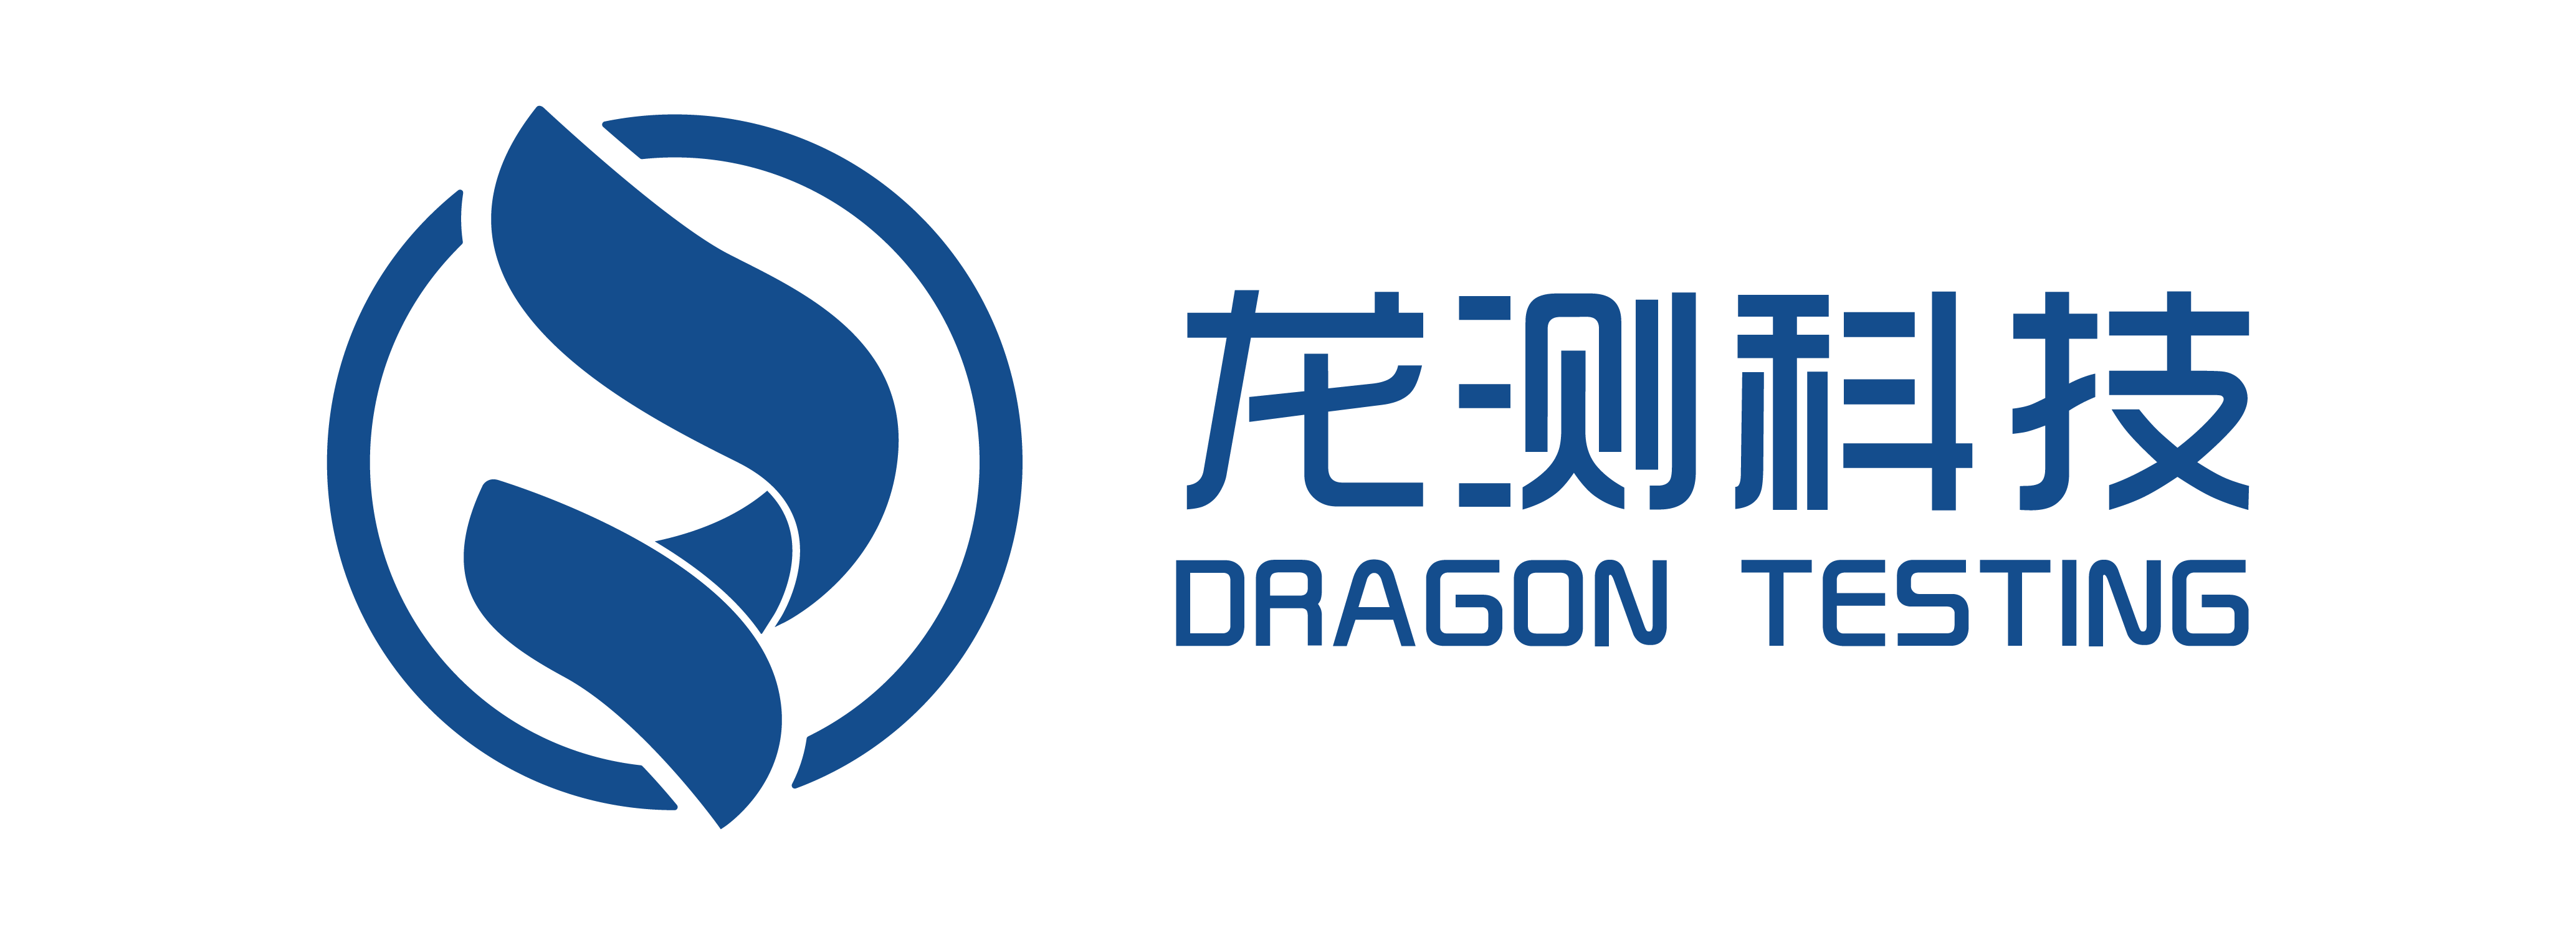 Dragon Testing Logo